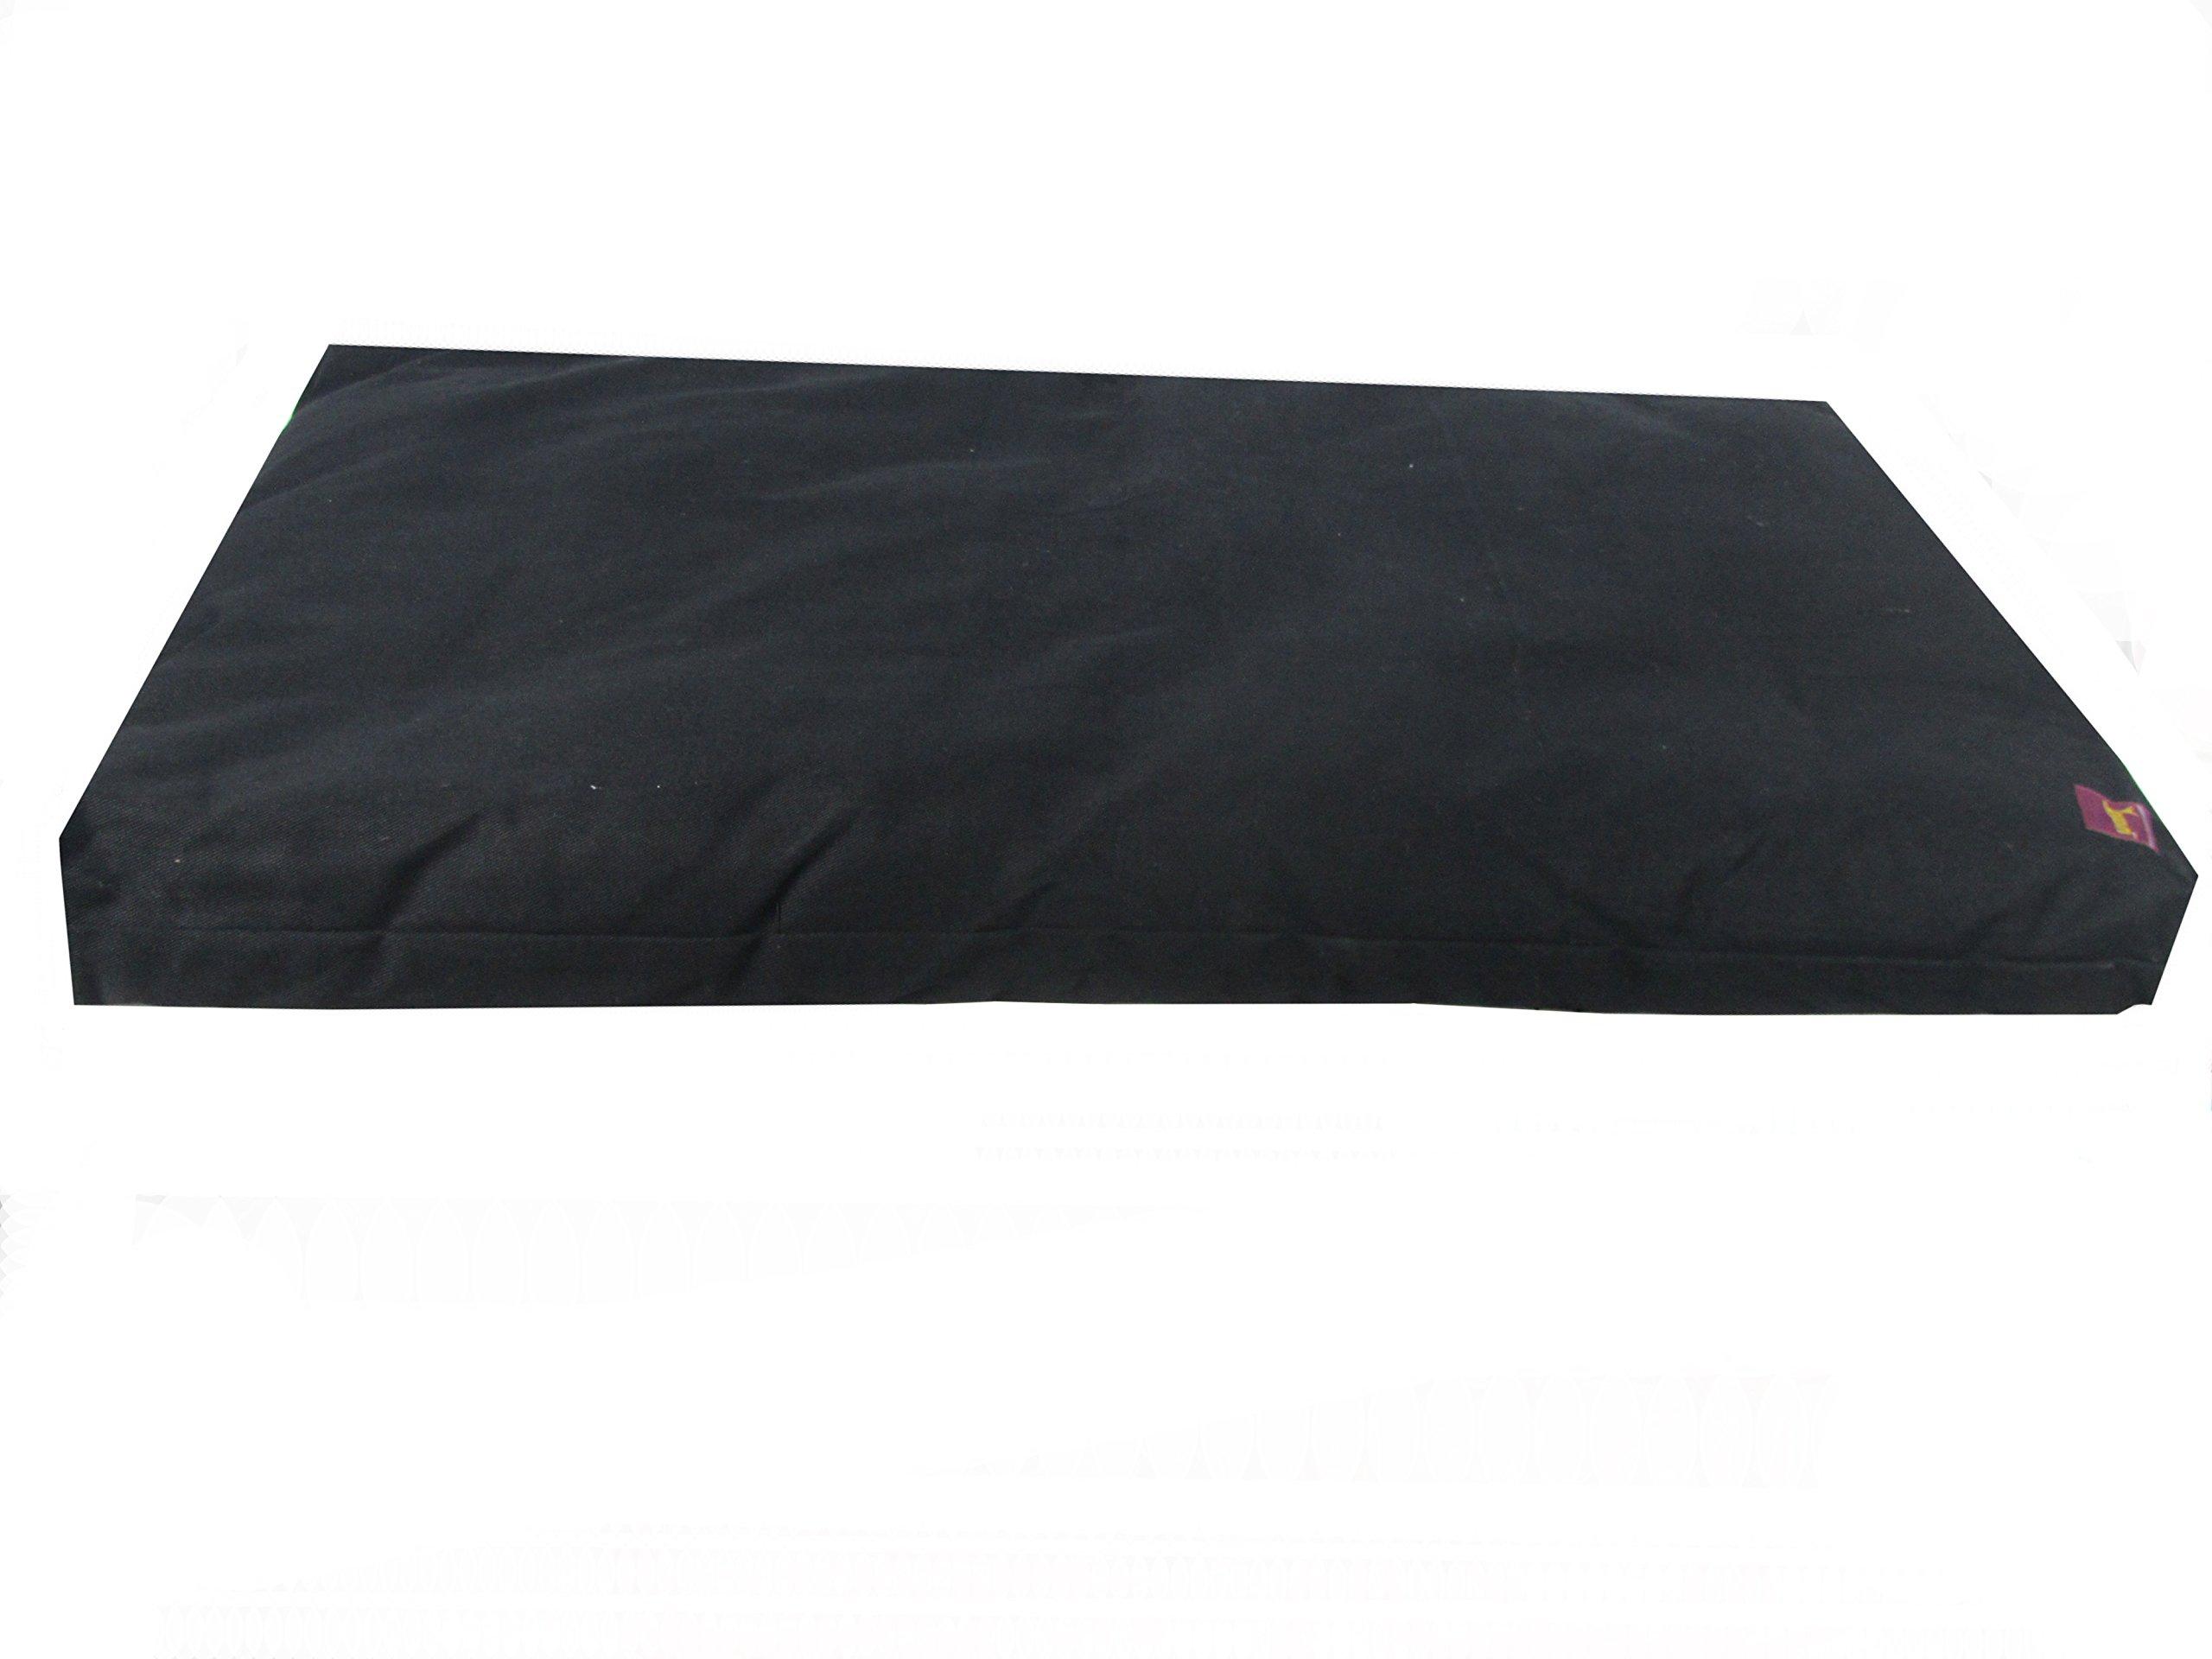 Deluxe Studio Style Yoga and Meditation Kit - Black Zabuton & Black Crescent Zafu by Yogavni(TM) by YogavniTM (Image #4)